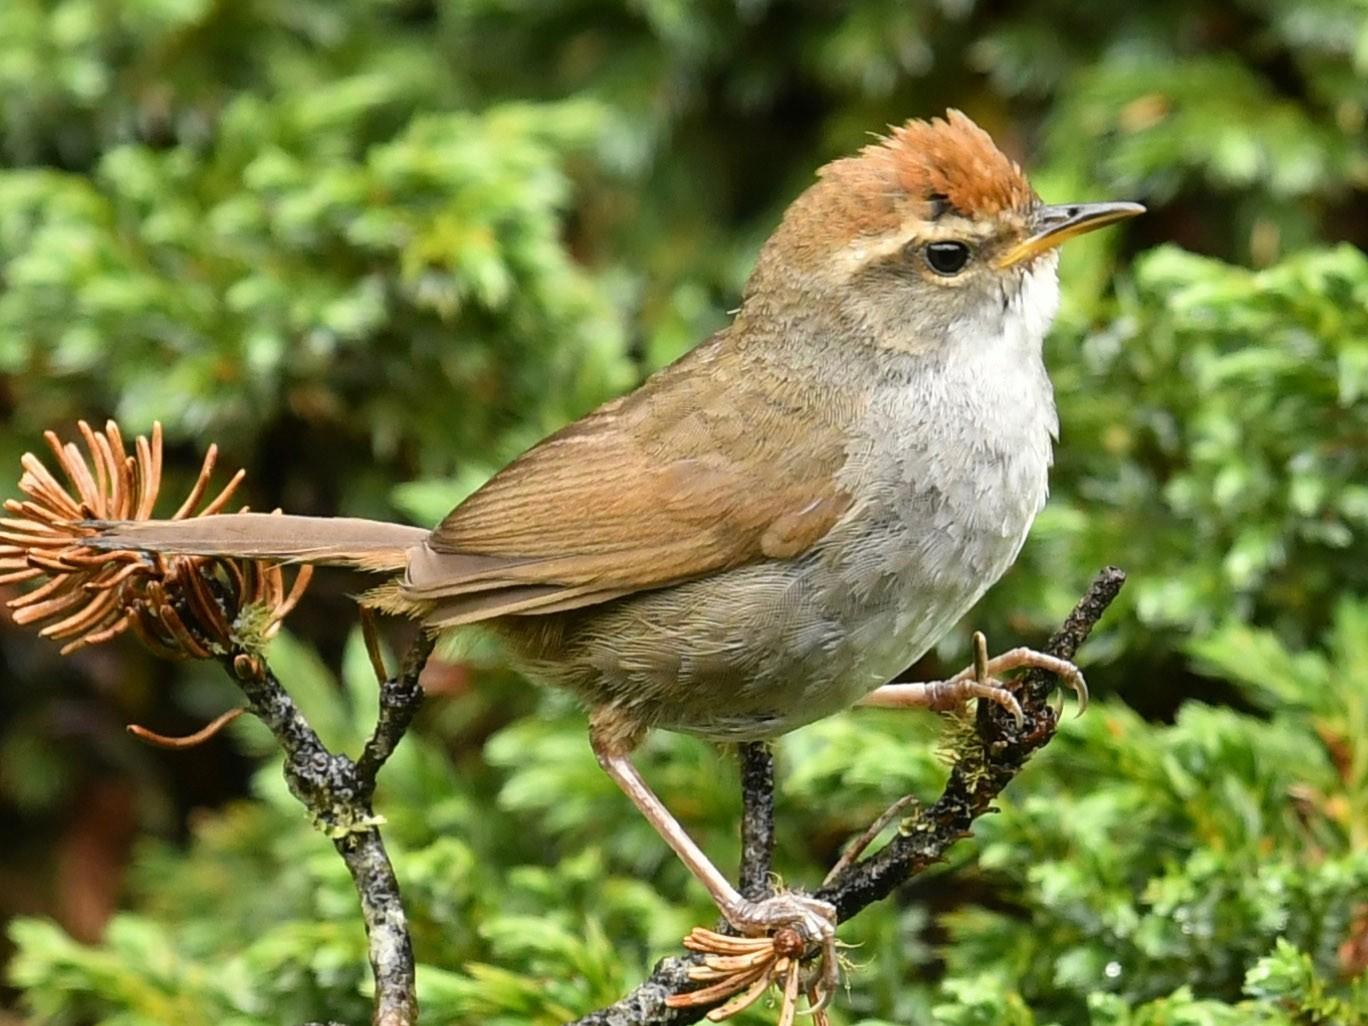 Gray-sided Bush Warbler - Qin Huang